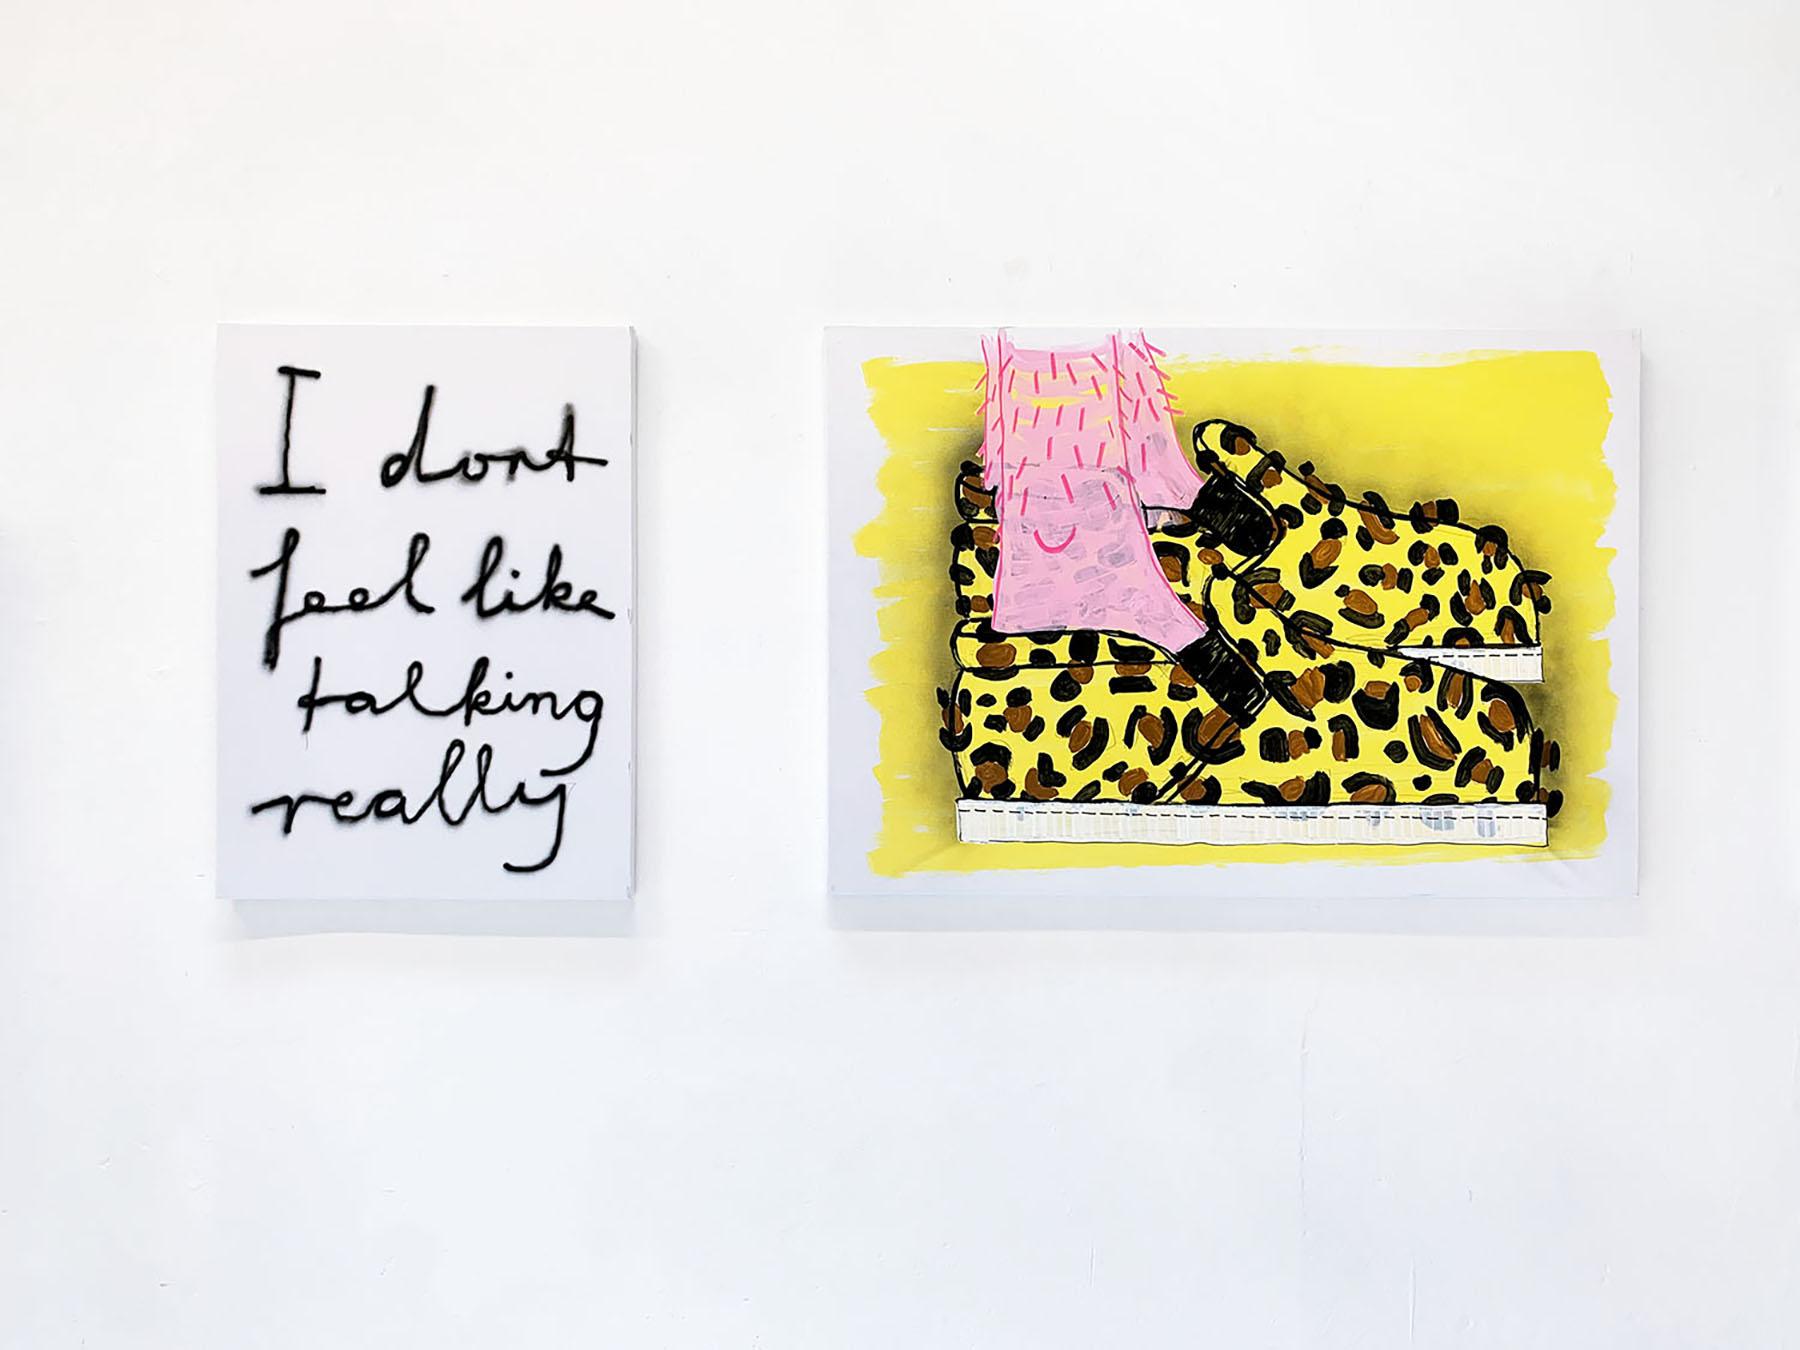 young artists, emerging, spain, uvxal gochez gallery, exhibitions, illusory